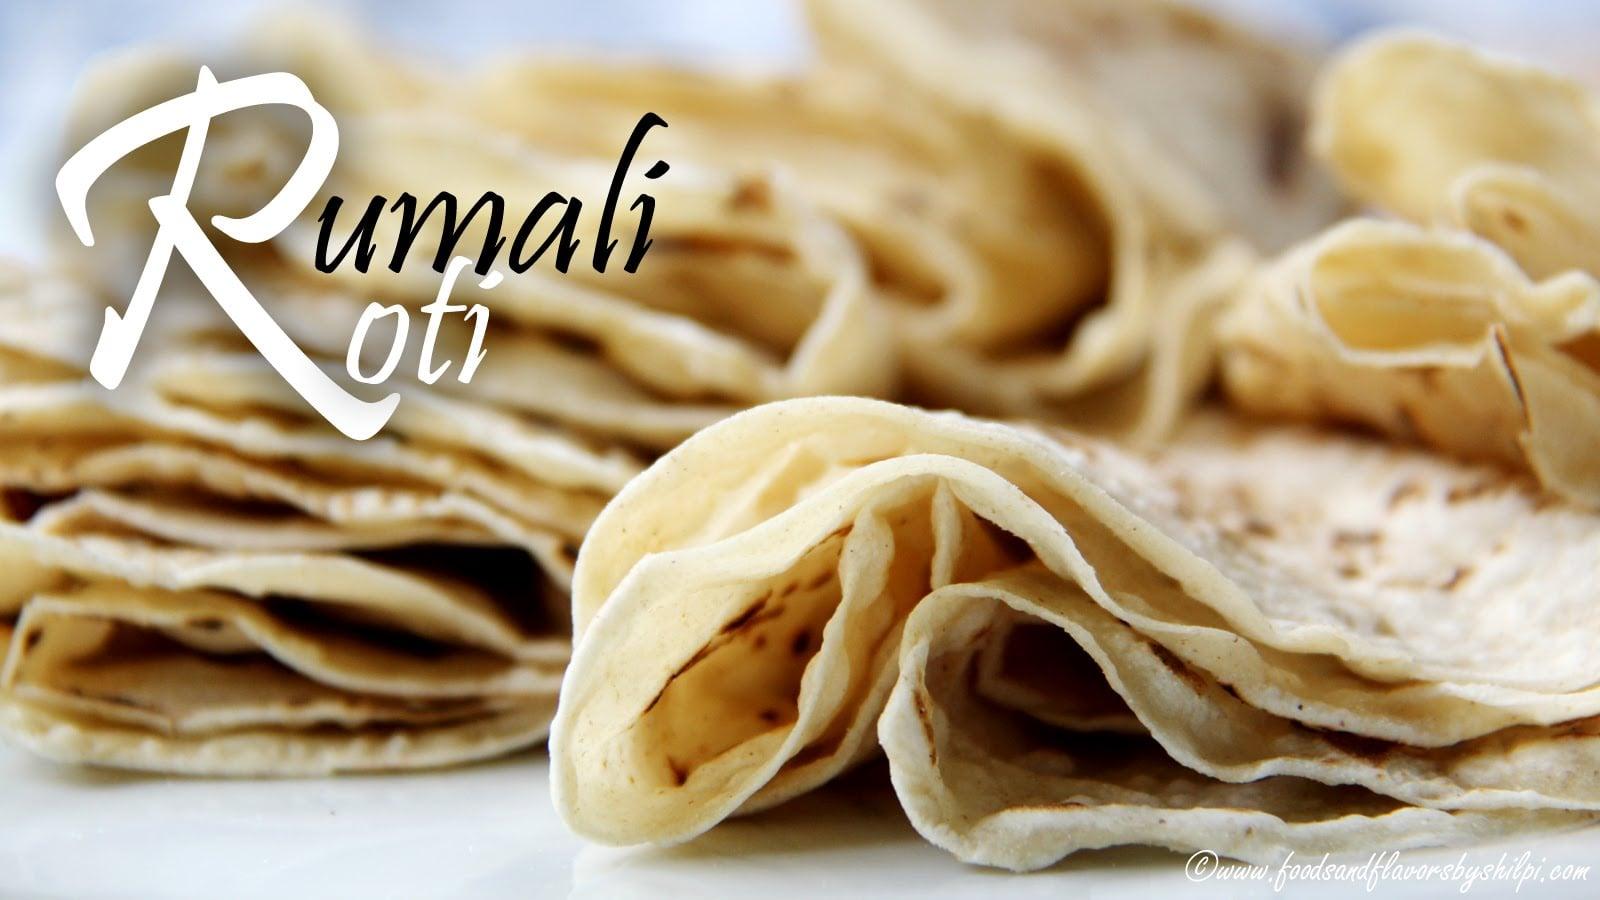 Rumali Roti Recipe | Soft Thin Roti Recipe | Indian Dinner Recipes | foodsandflavorsbyshilpi.com